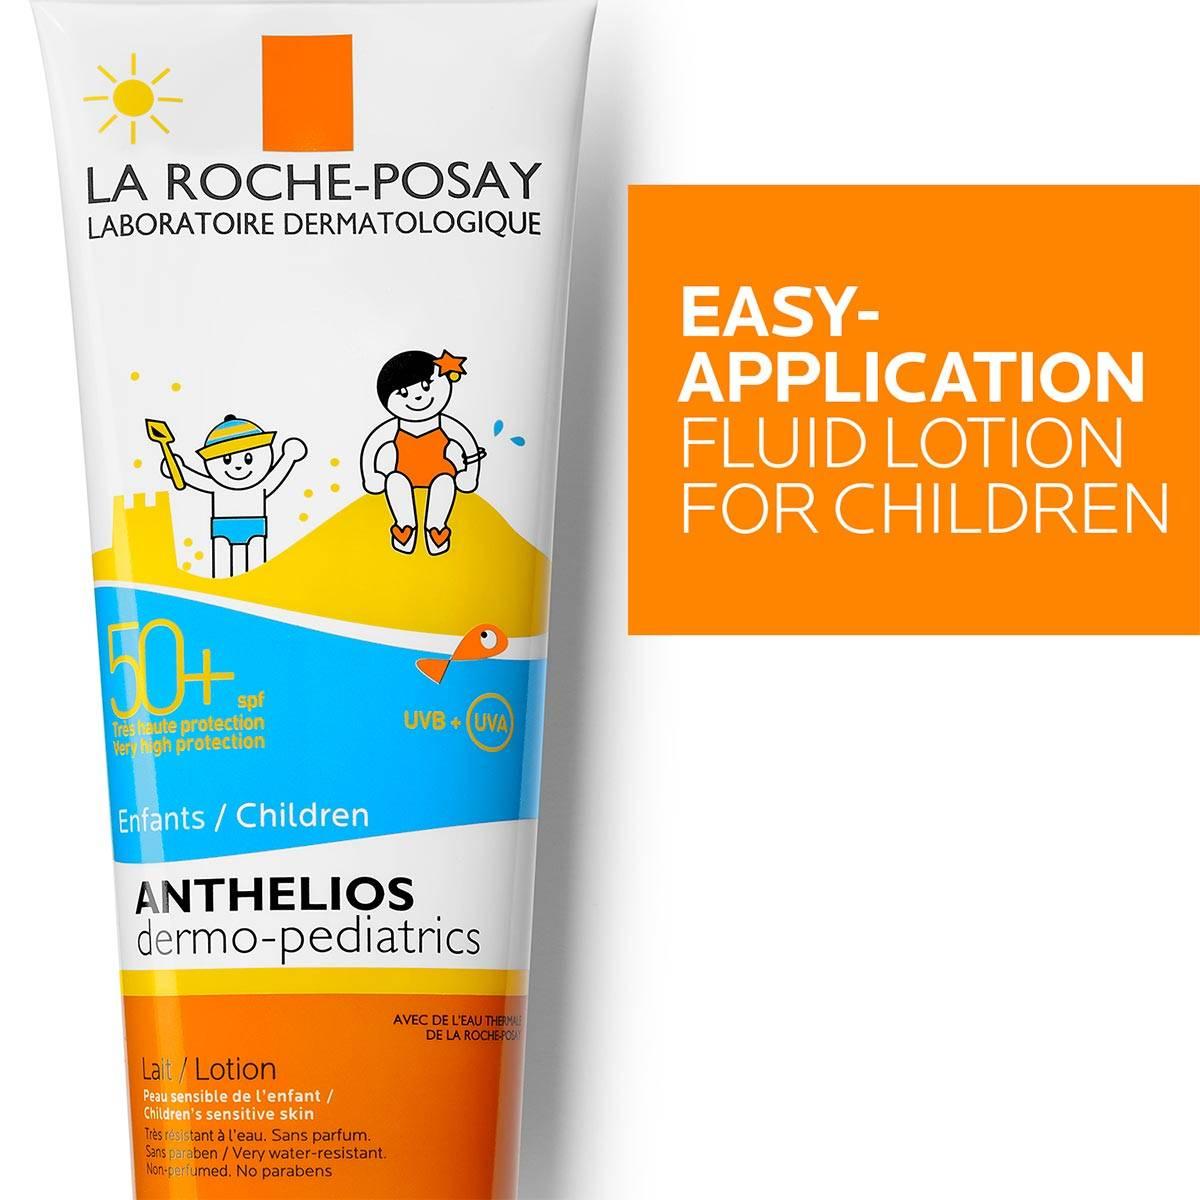 La Roche Posay ProduktSide Sol Anthelios DP Spf50 Smooth Lotion 250ml